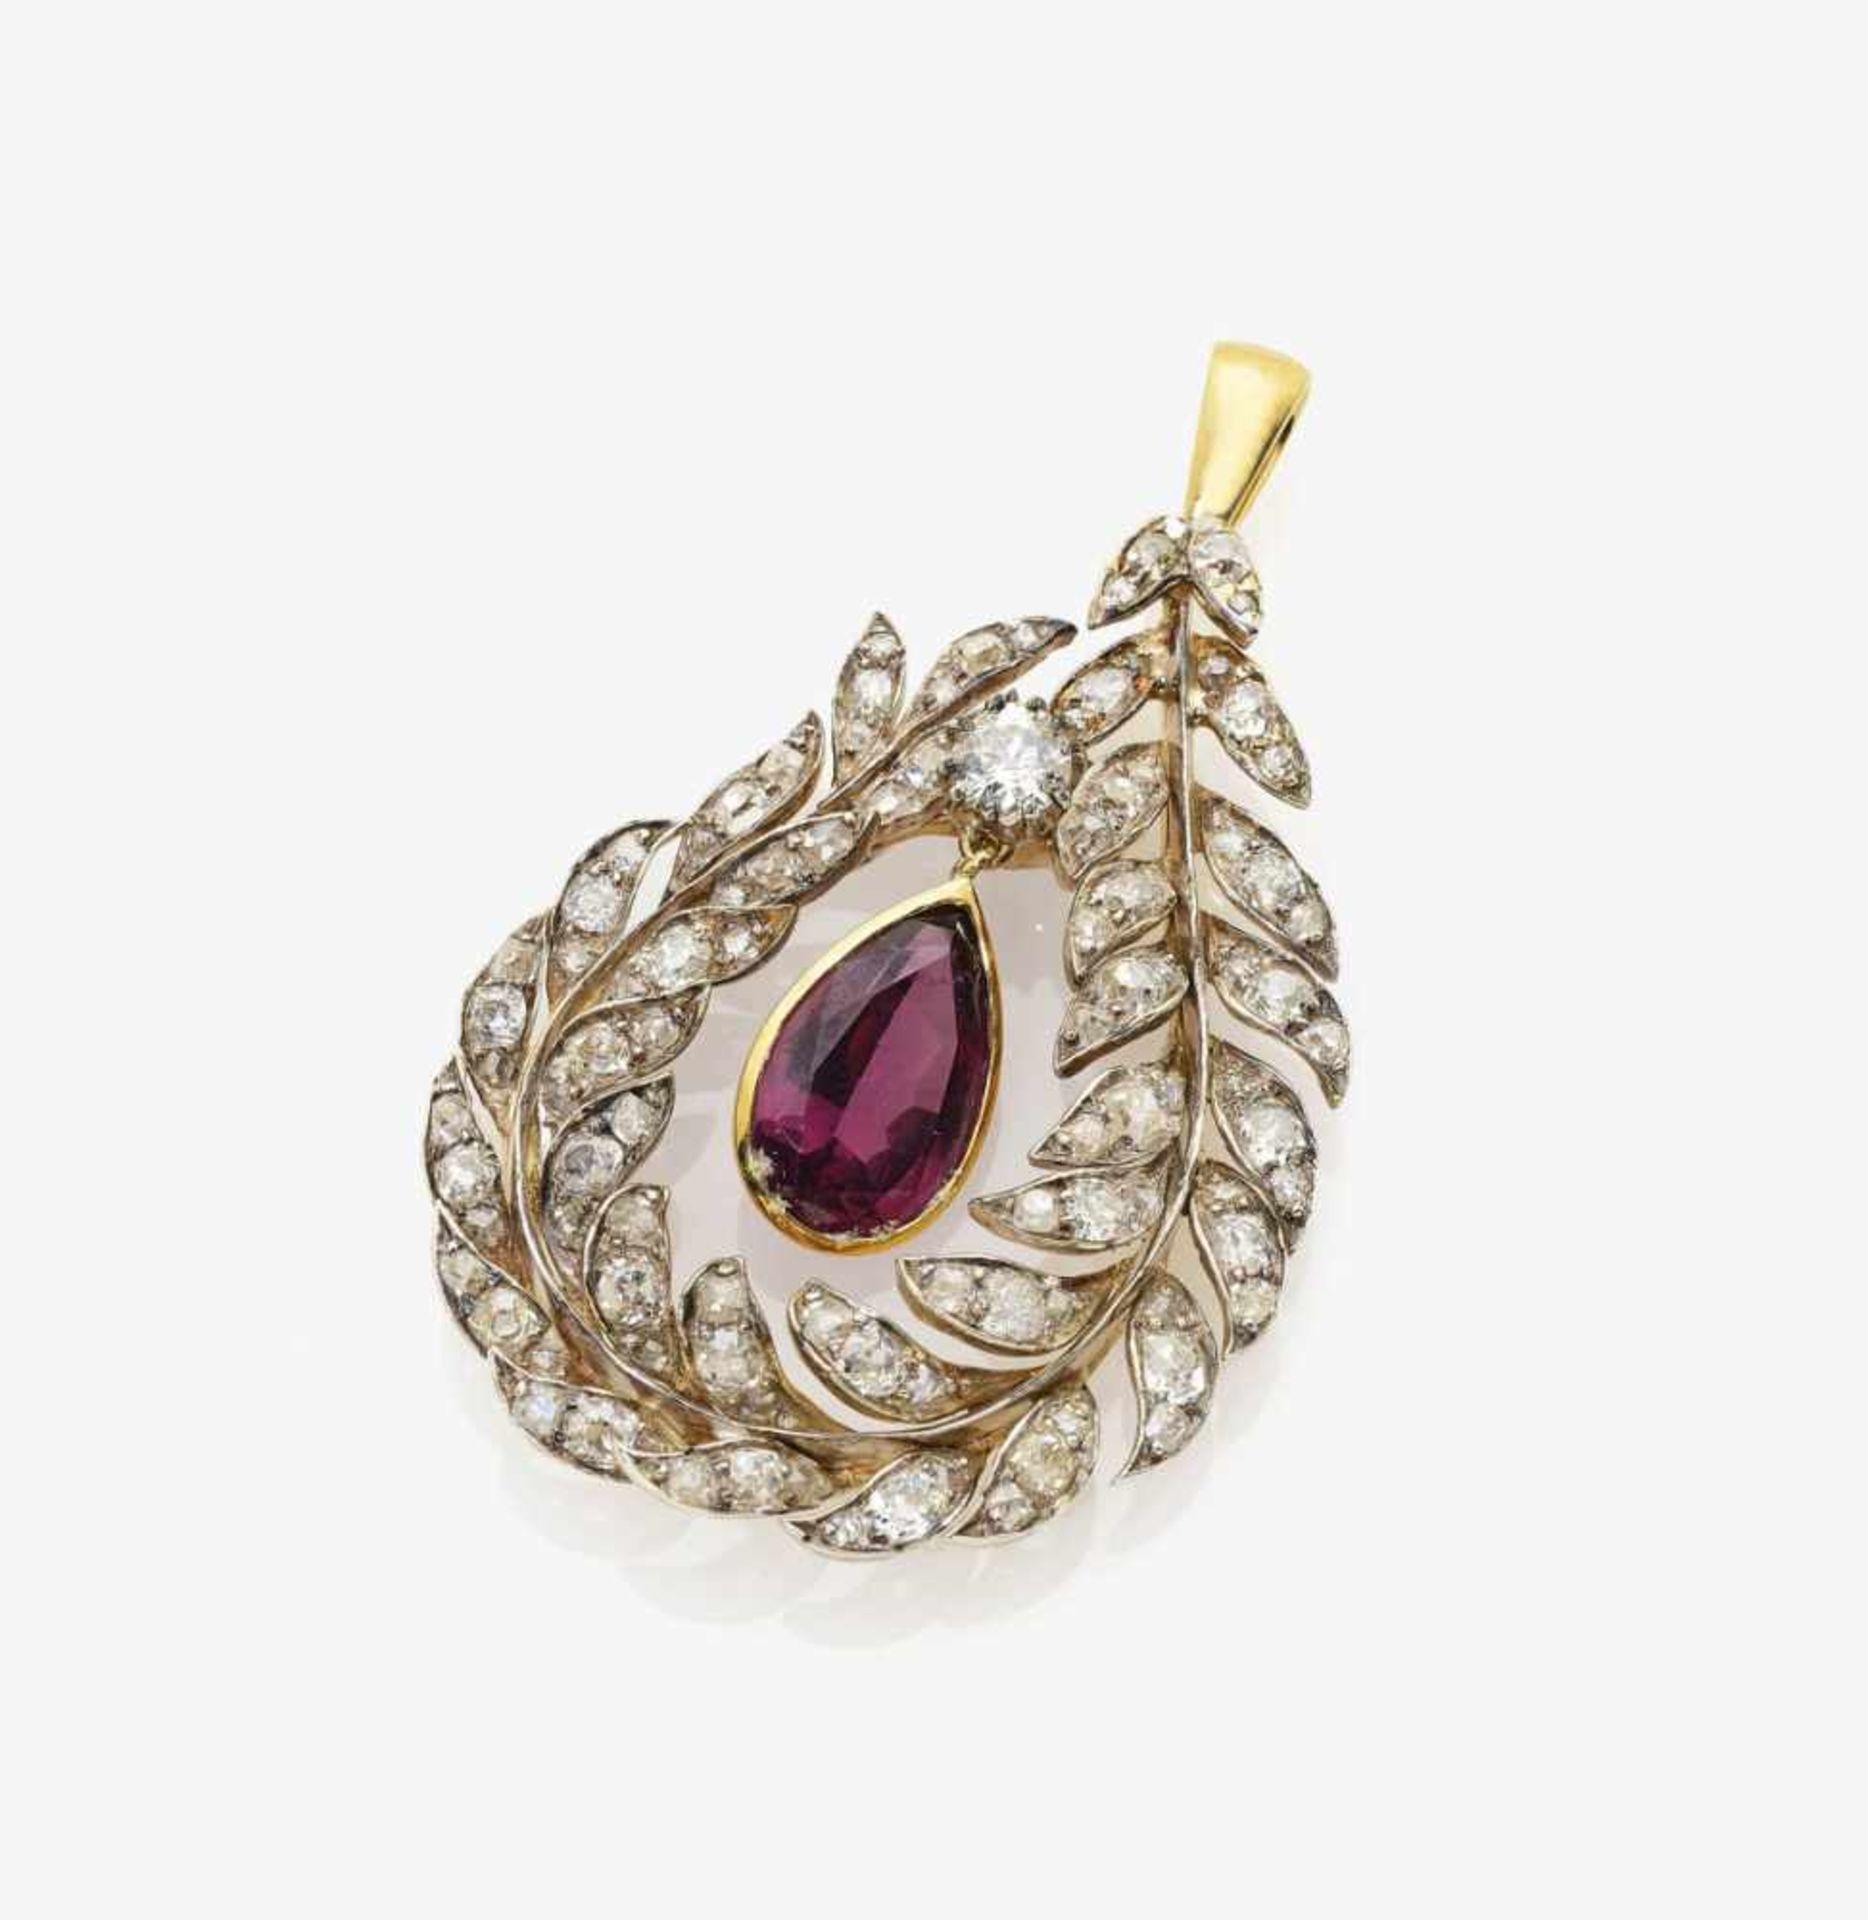 Los 1008 - A Diamond and Garnet Pendant